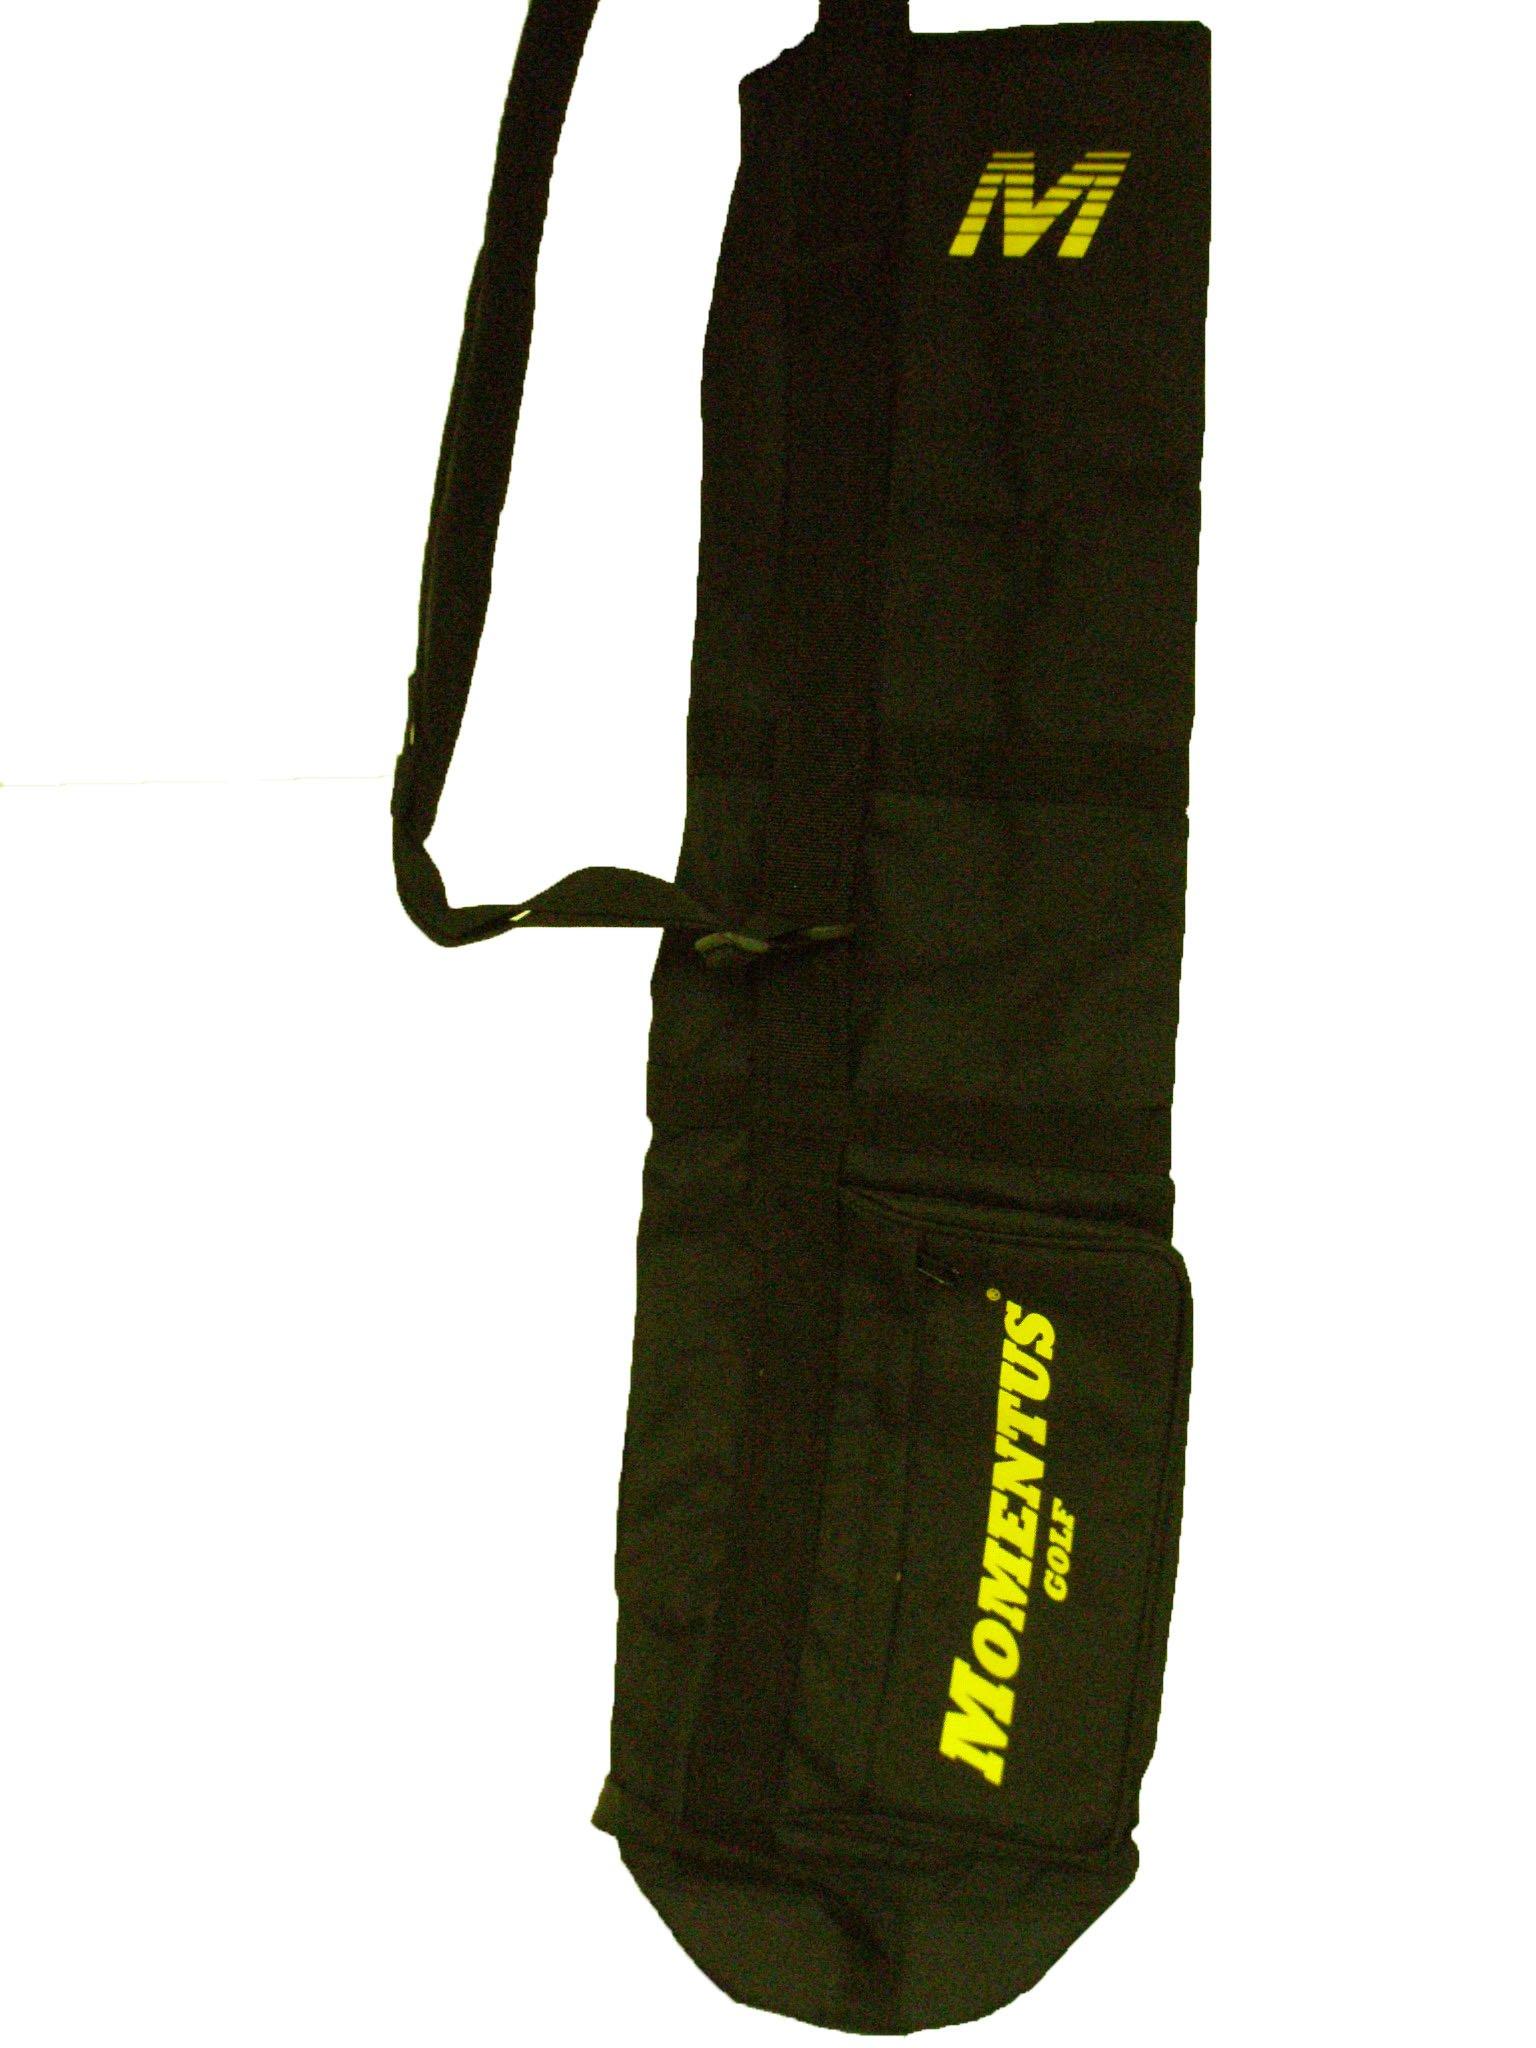 Momentus Golf Sunday Bag (Black, 8'' x 32'') Golf Carry Bag